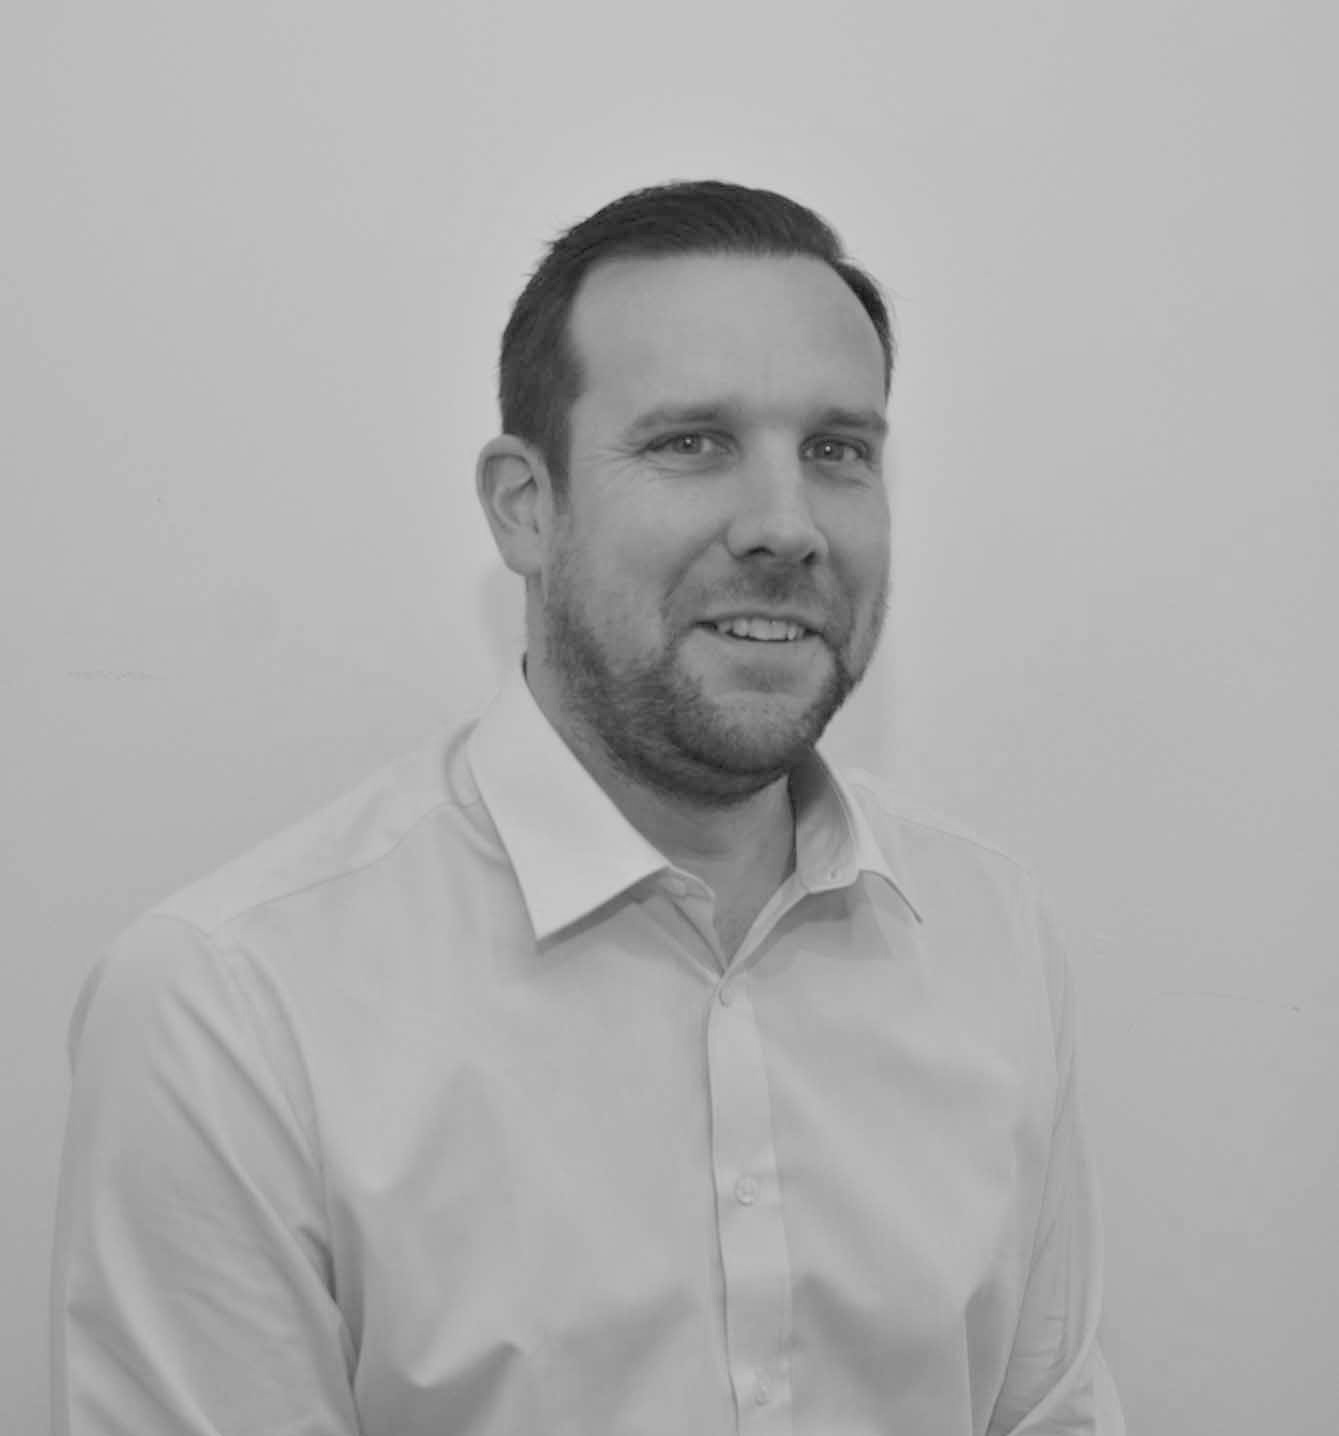 Steve Hollick -  Technical Director